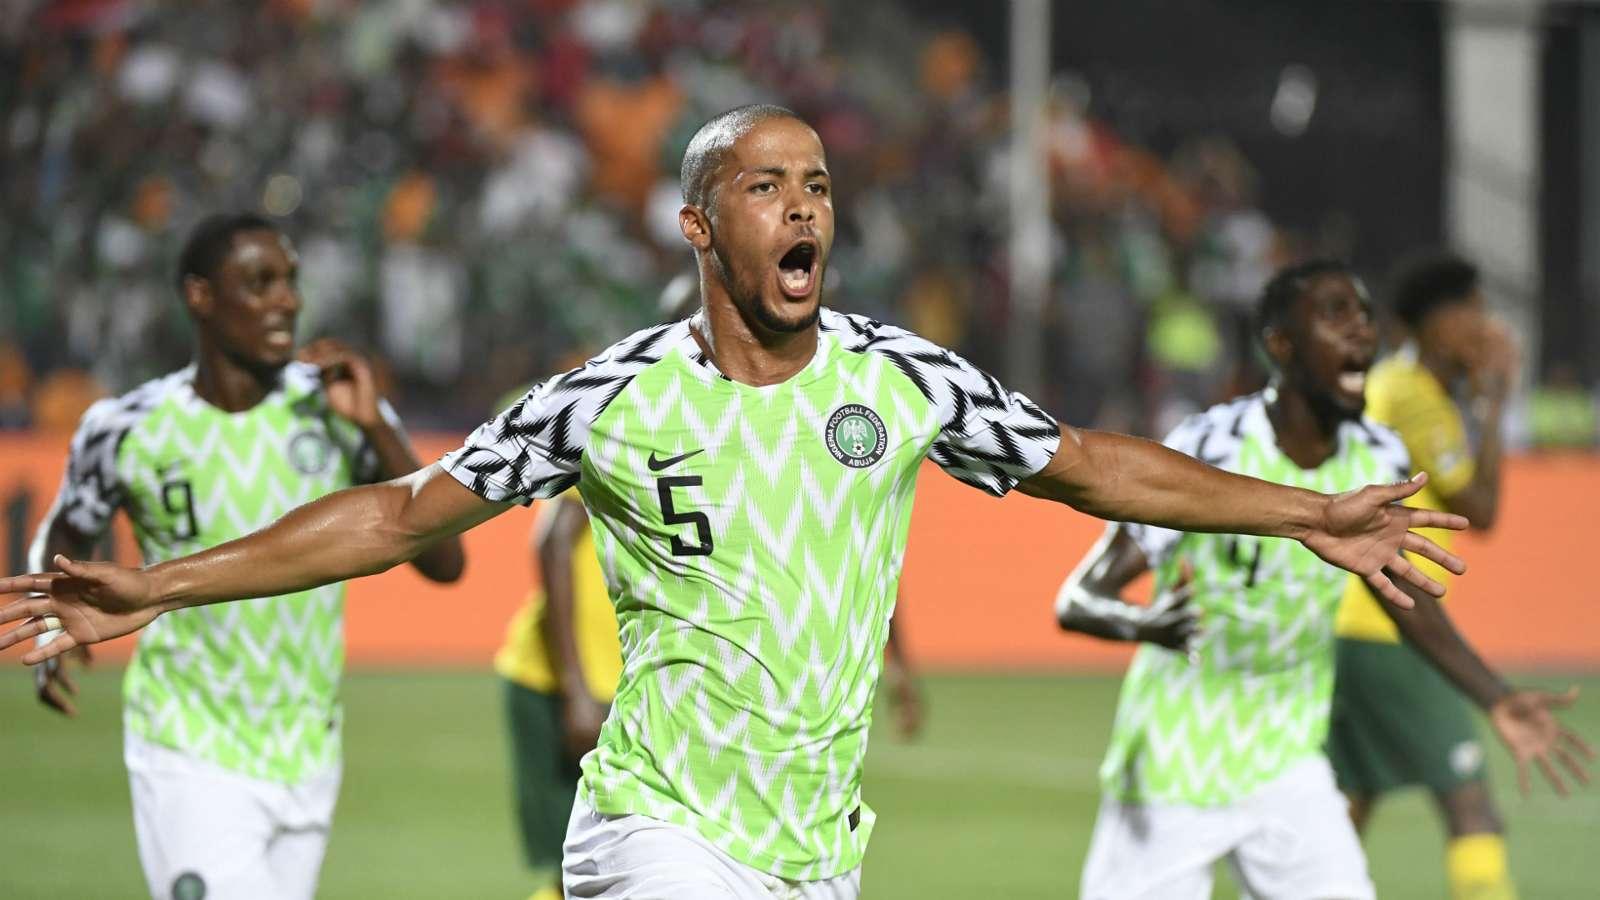 Afcon 2019:尼日利亚很幸运能够在对阵南非的最后一分钟进球 - 罗尔